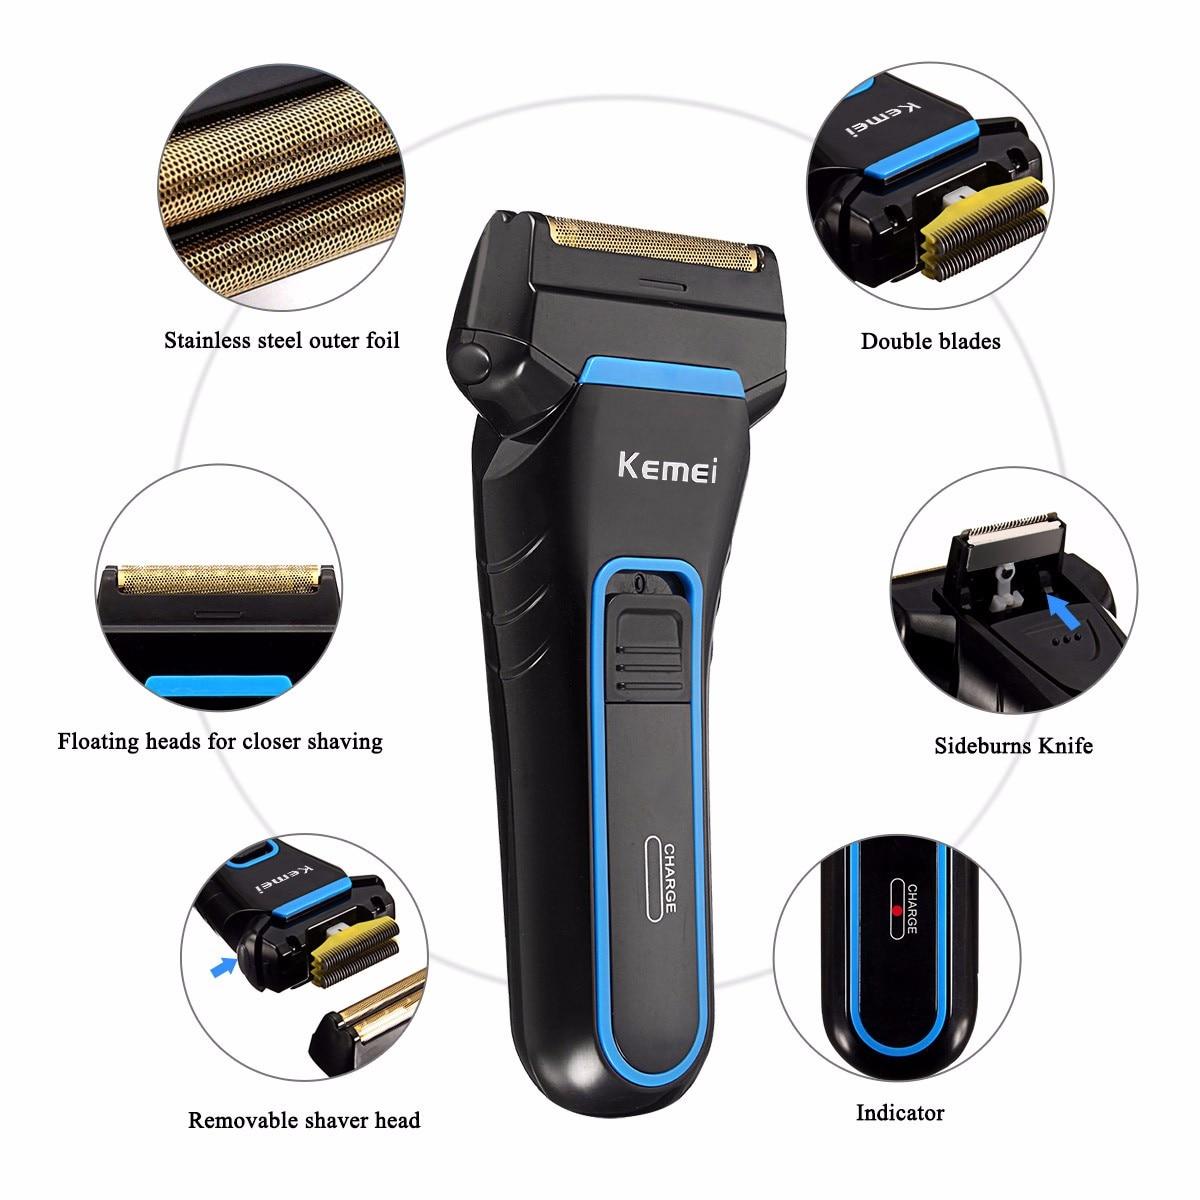 Kemei Men Electric Razor Shaver Portable Cordless Dual Foil Shaver Rechargeable Beard Razor Trimmer Razor Electric Shaver электроскейтборд razor ripstik electric 021803